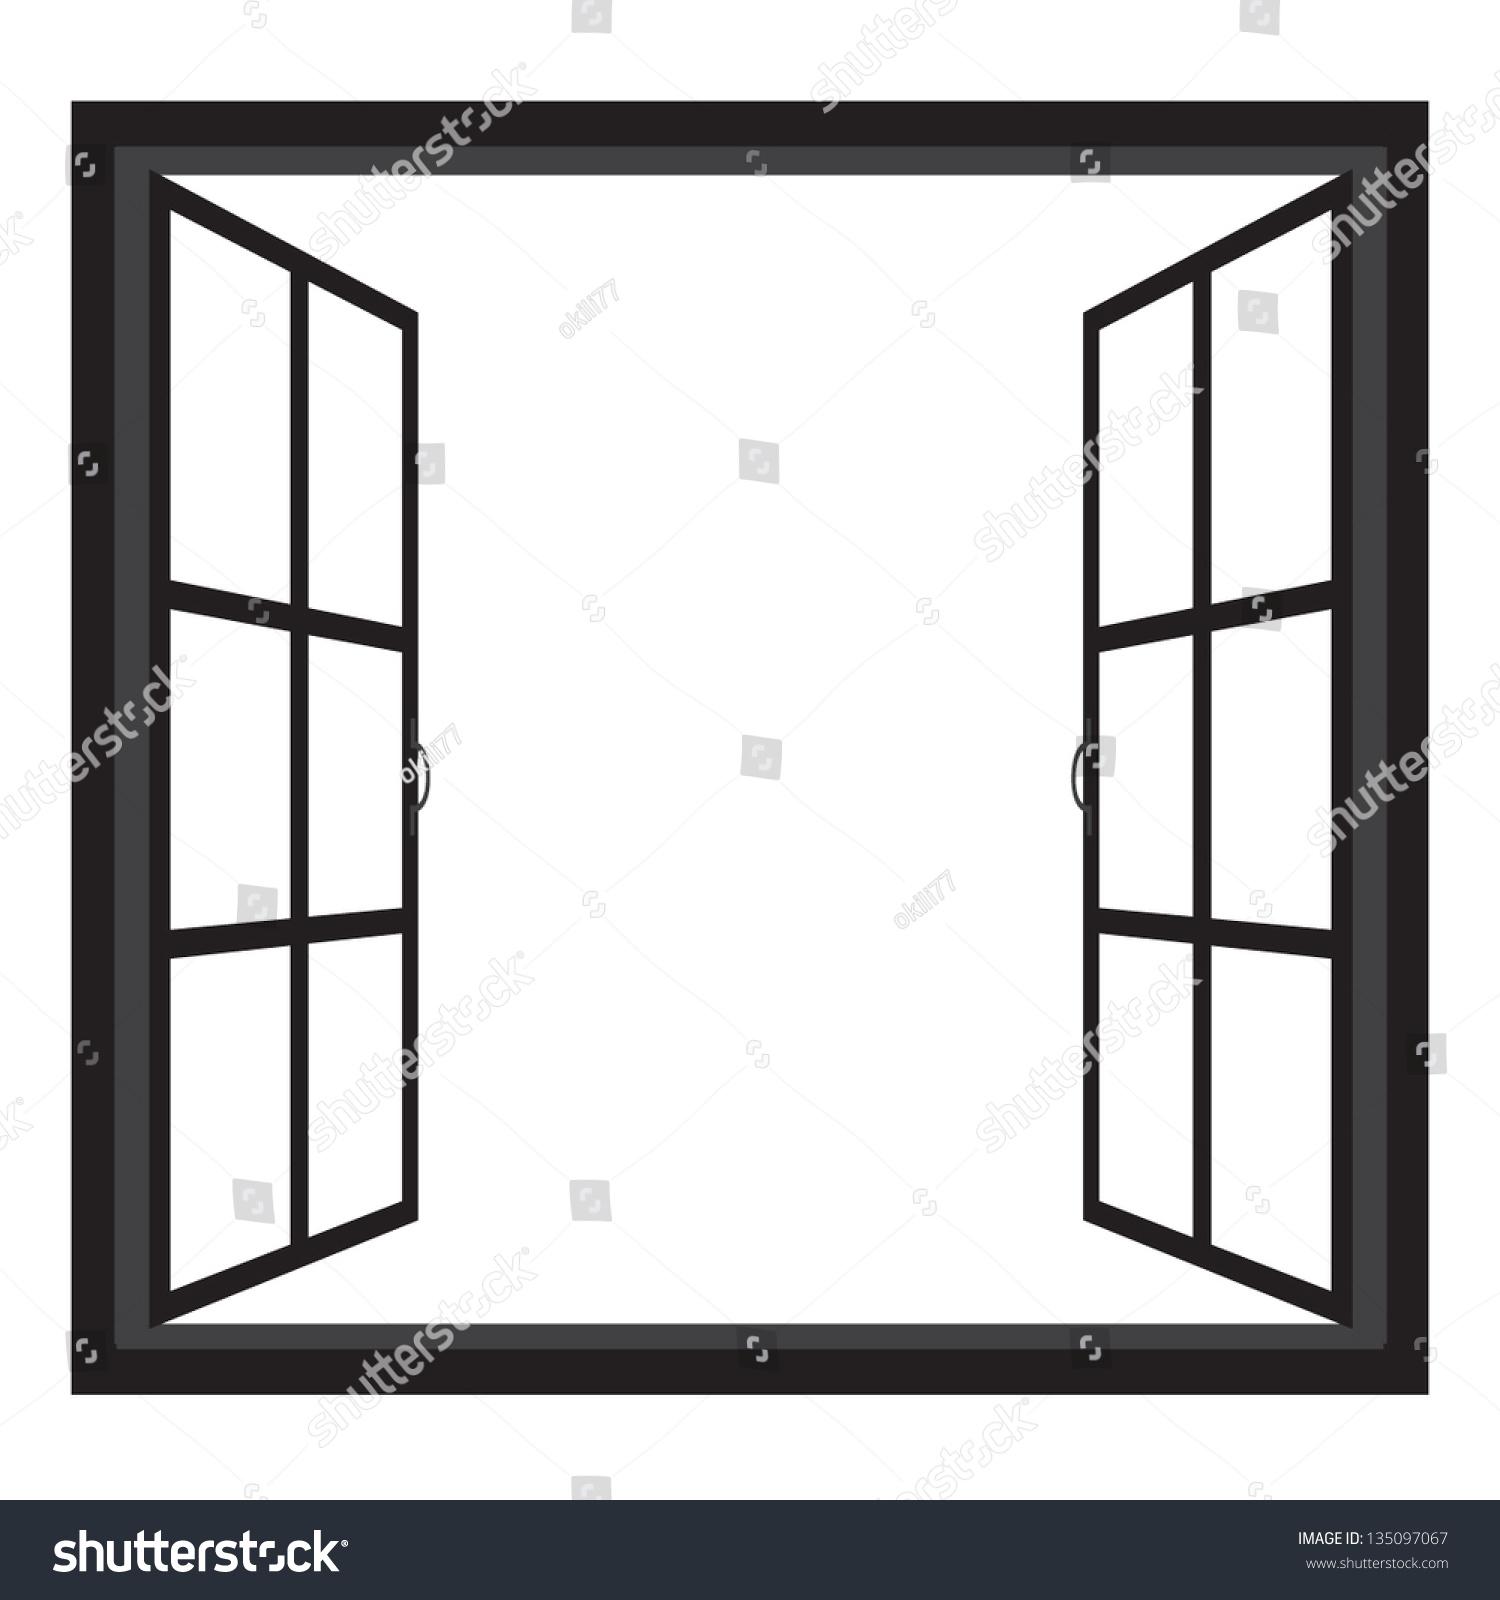 Open Window Clipart Clipart Suggest: Windowswide Open Window Silhouette Vector Stock Vector